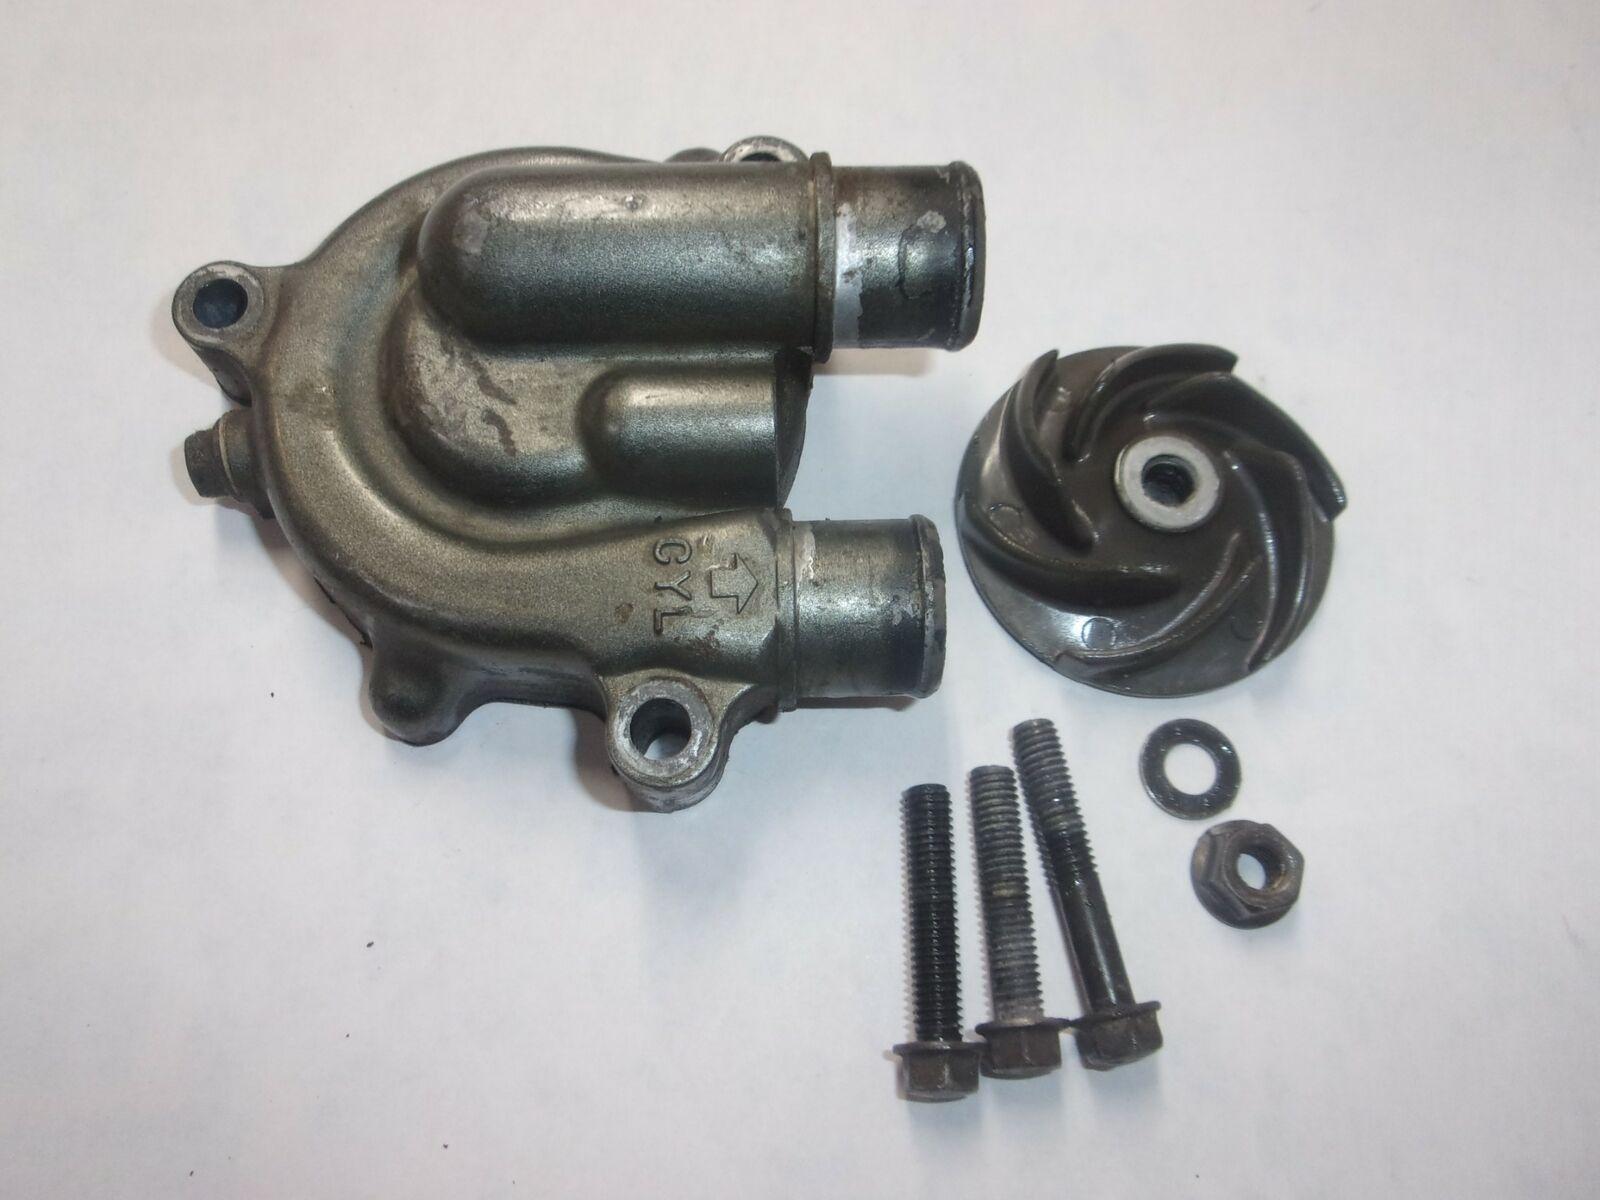 MG 8869 Water Pump Coolant Water Pump Cover Gasket for Kawasaki KLR 650 KL650 KLR 650 KL 650 87-2019